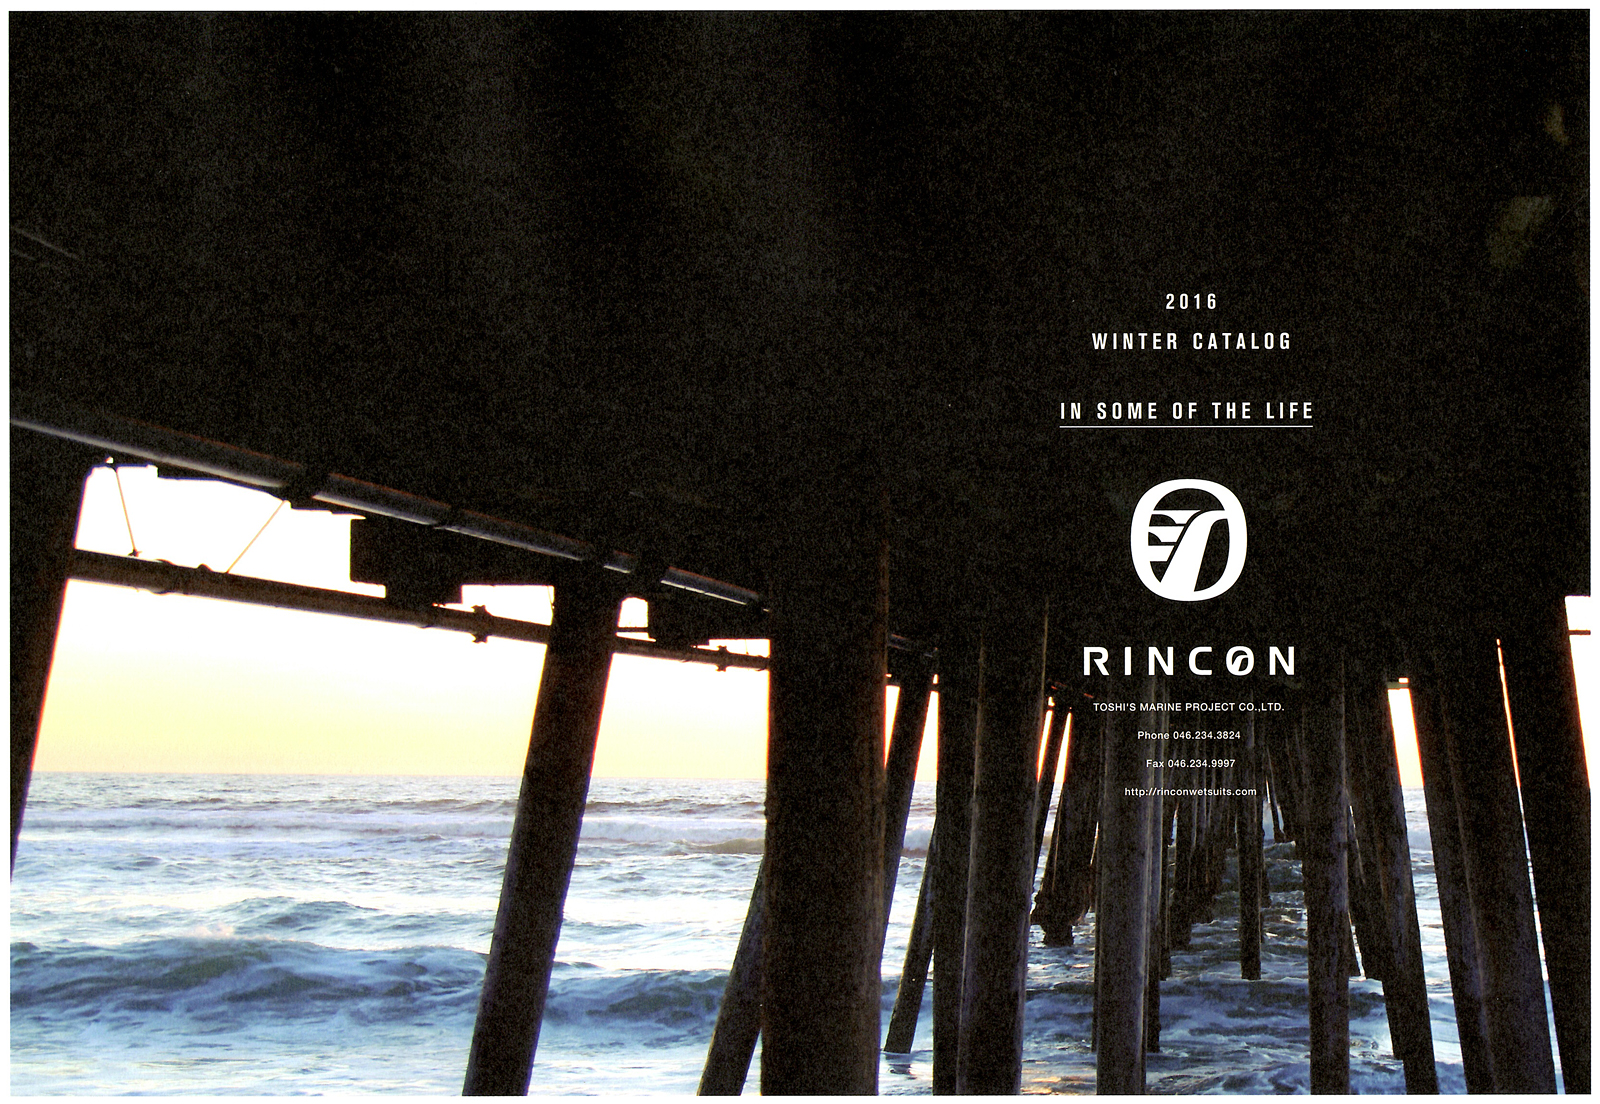 rincon-1